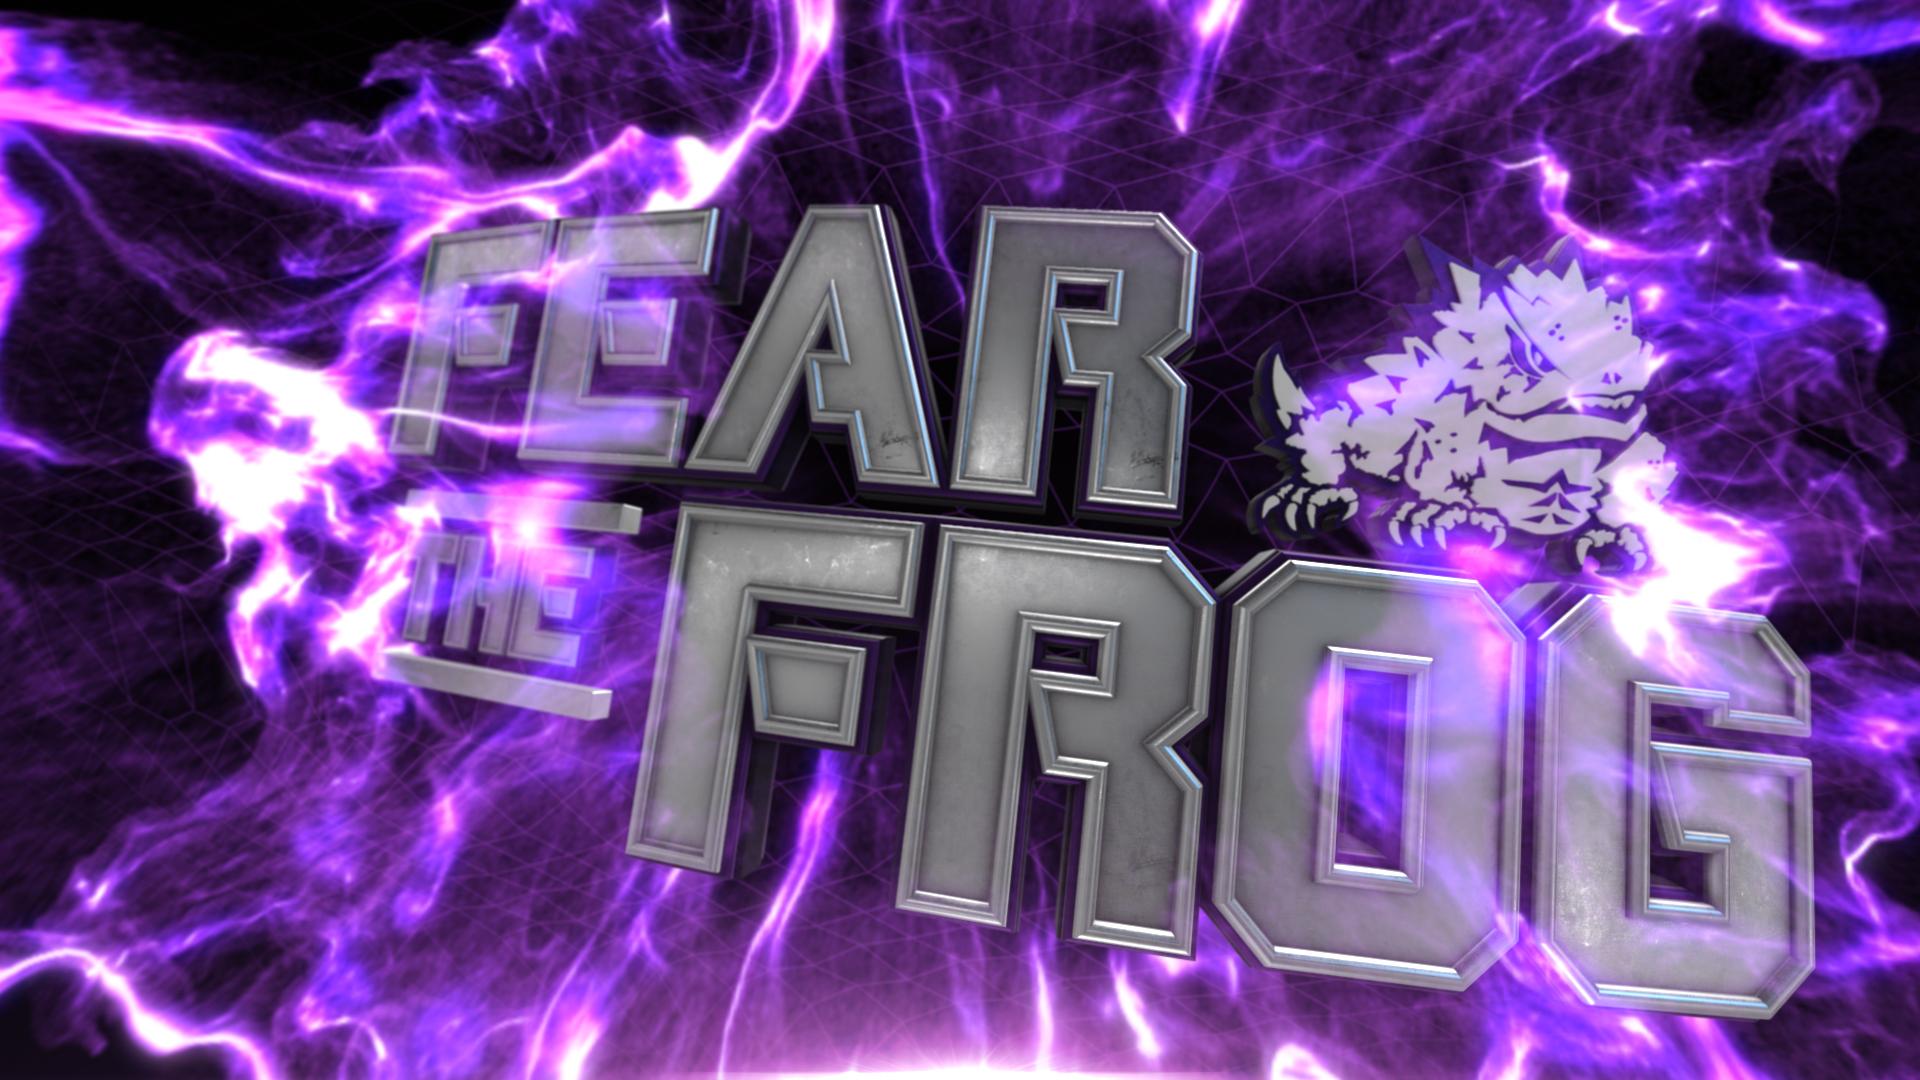 TCU_FearTheFrog00021.jpg